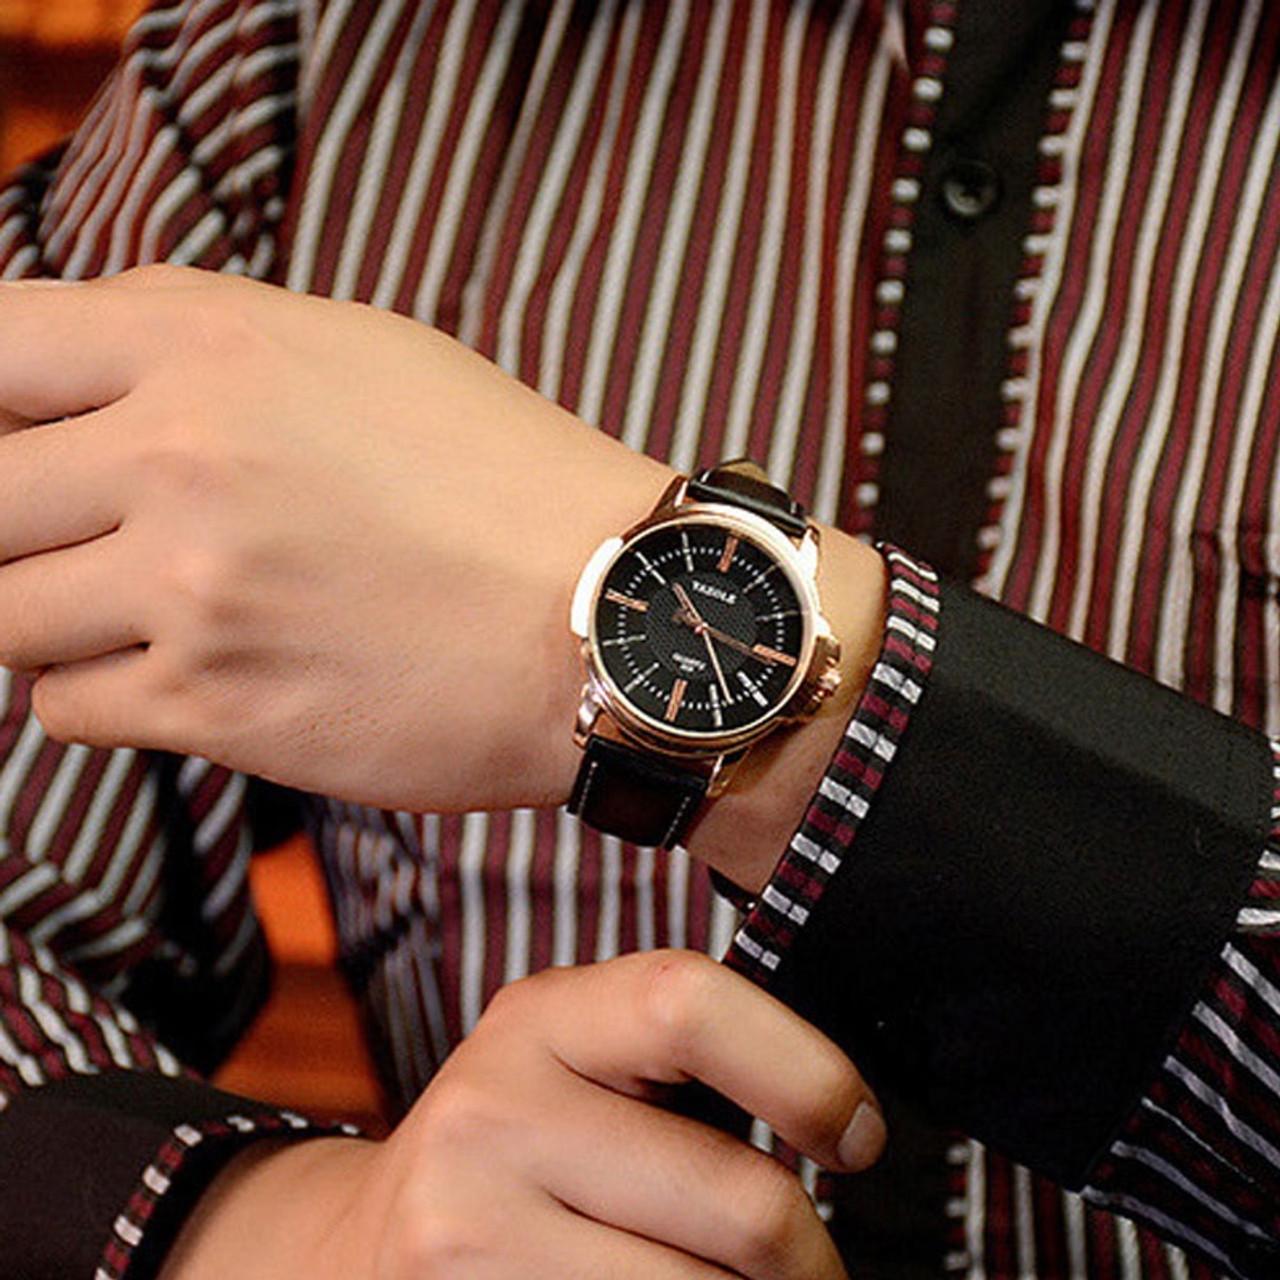 b5f5e614fc YAZOLE Rose Gold Wrist Watch Men 2018 Top Brand Luxury Famous For Male  Clock Quartz Watch Golden Wristwatch Relogio Masculino